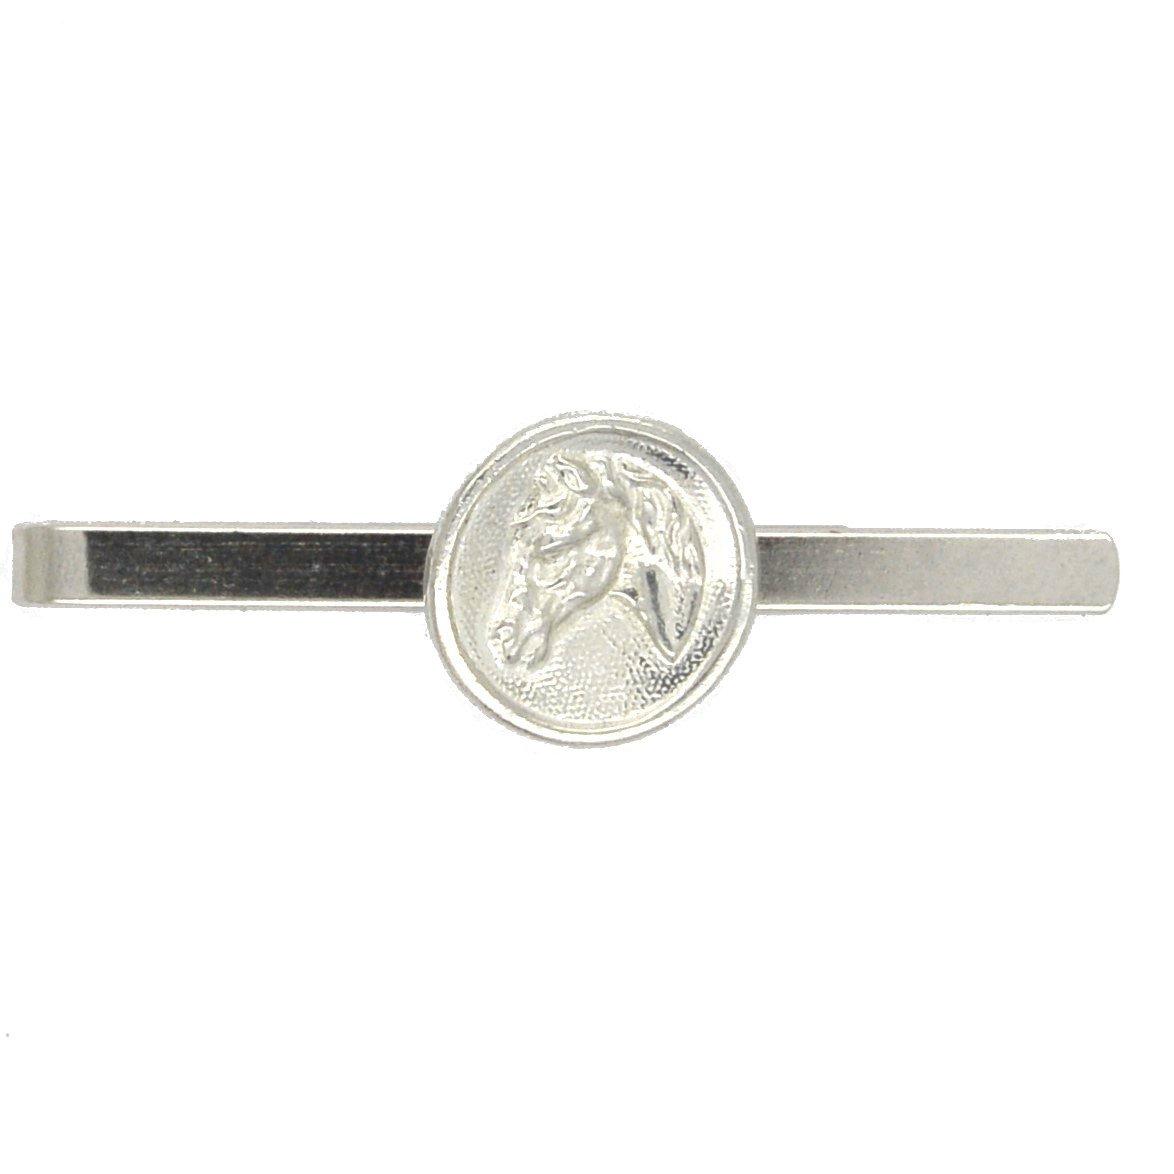 Beautiful American Quarter Horse Tie Clip (Slide/Bar), Handcast by William Sturt